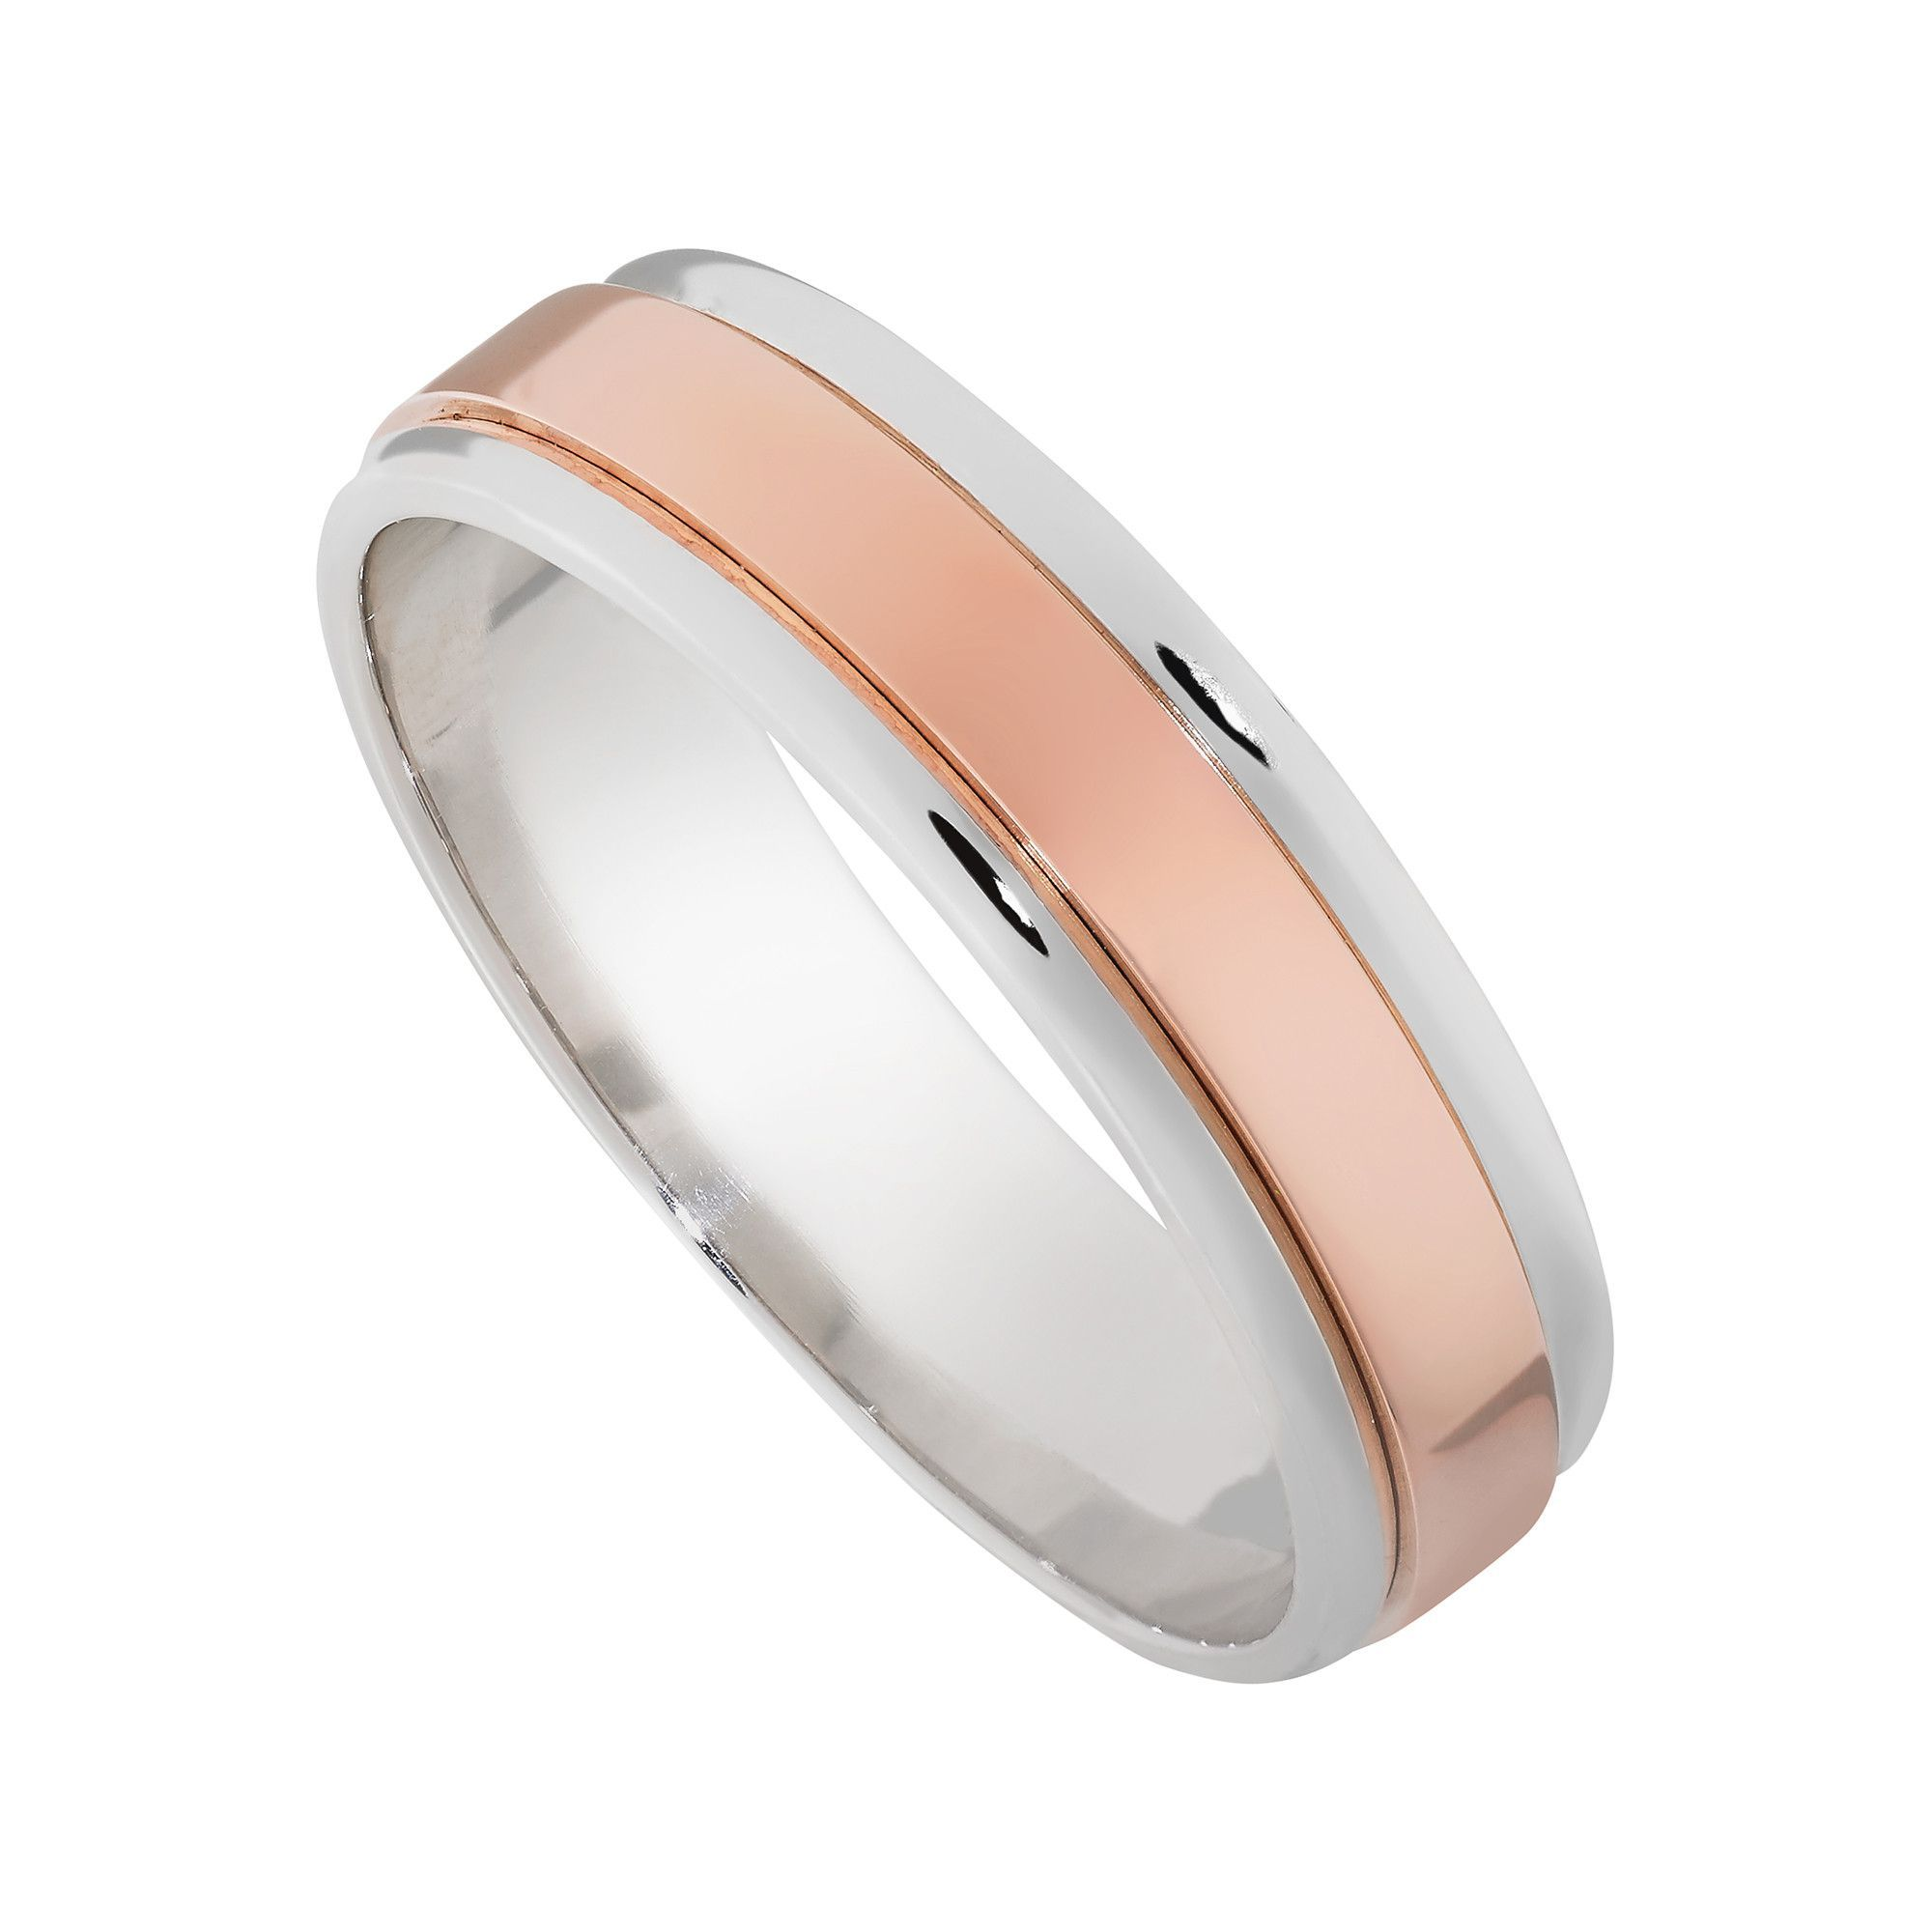 6mm mens wedding band white gold